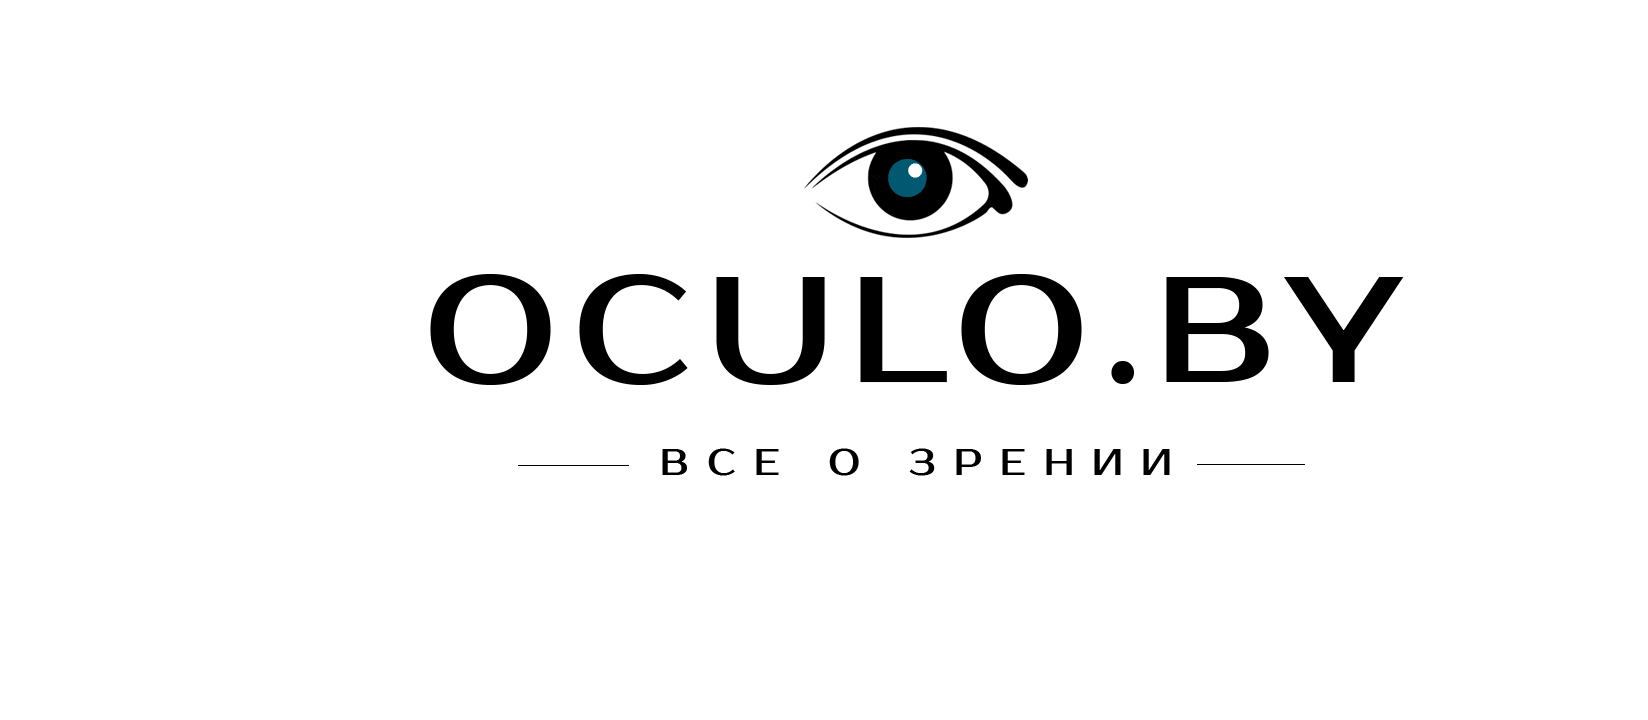 Oculo.by